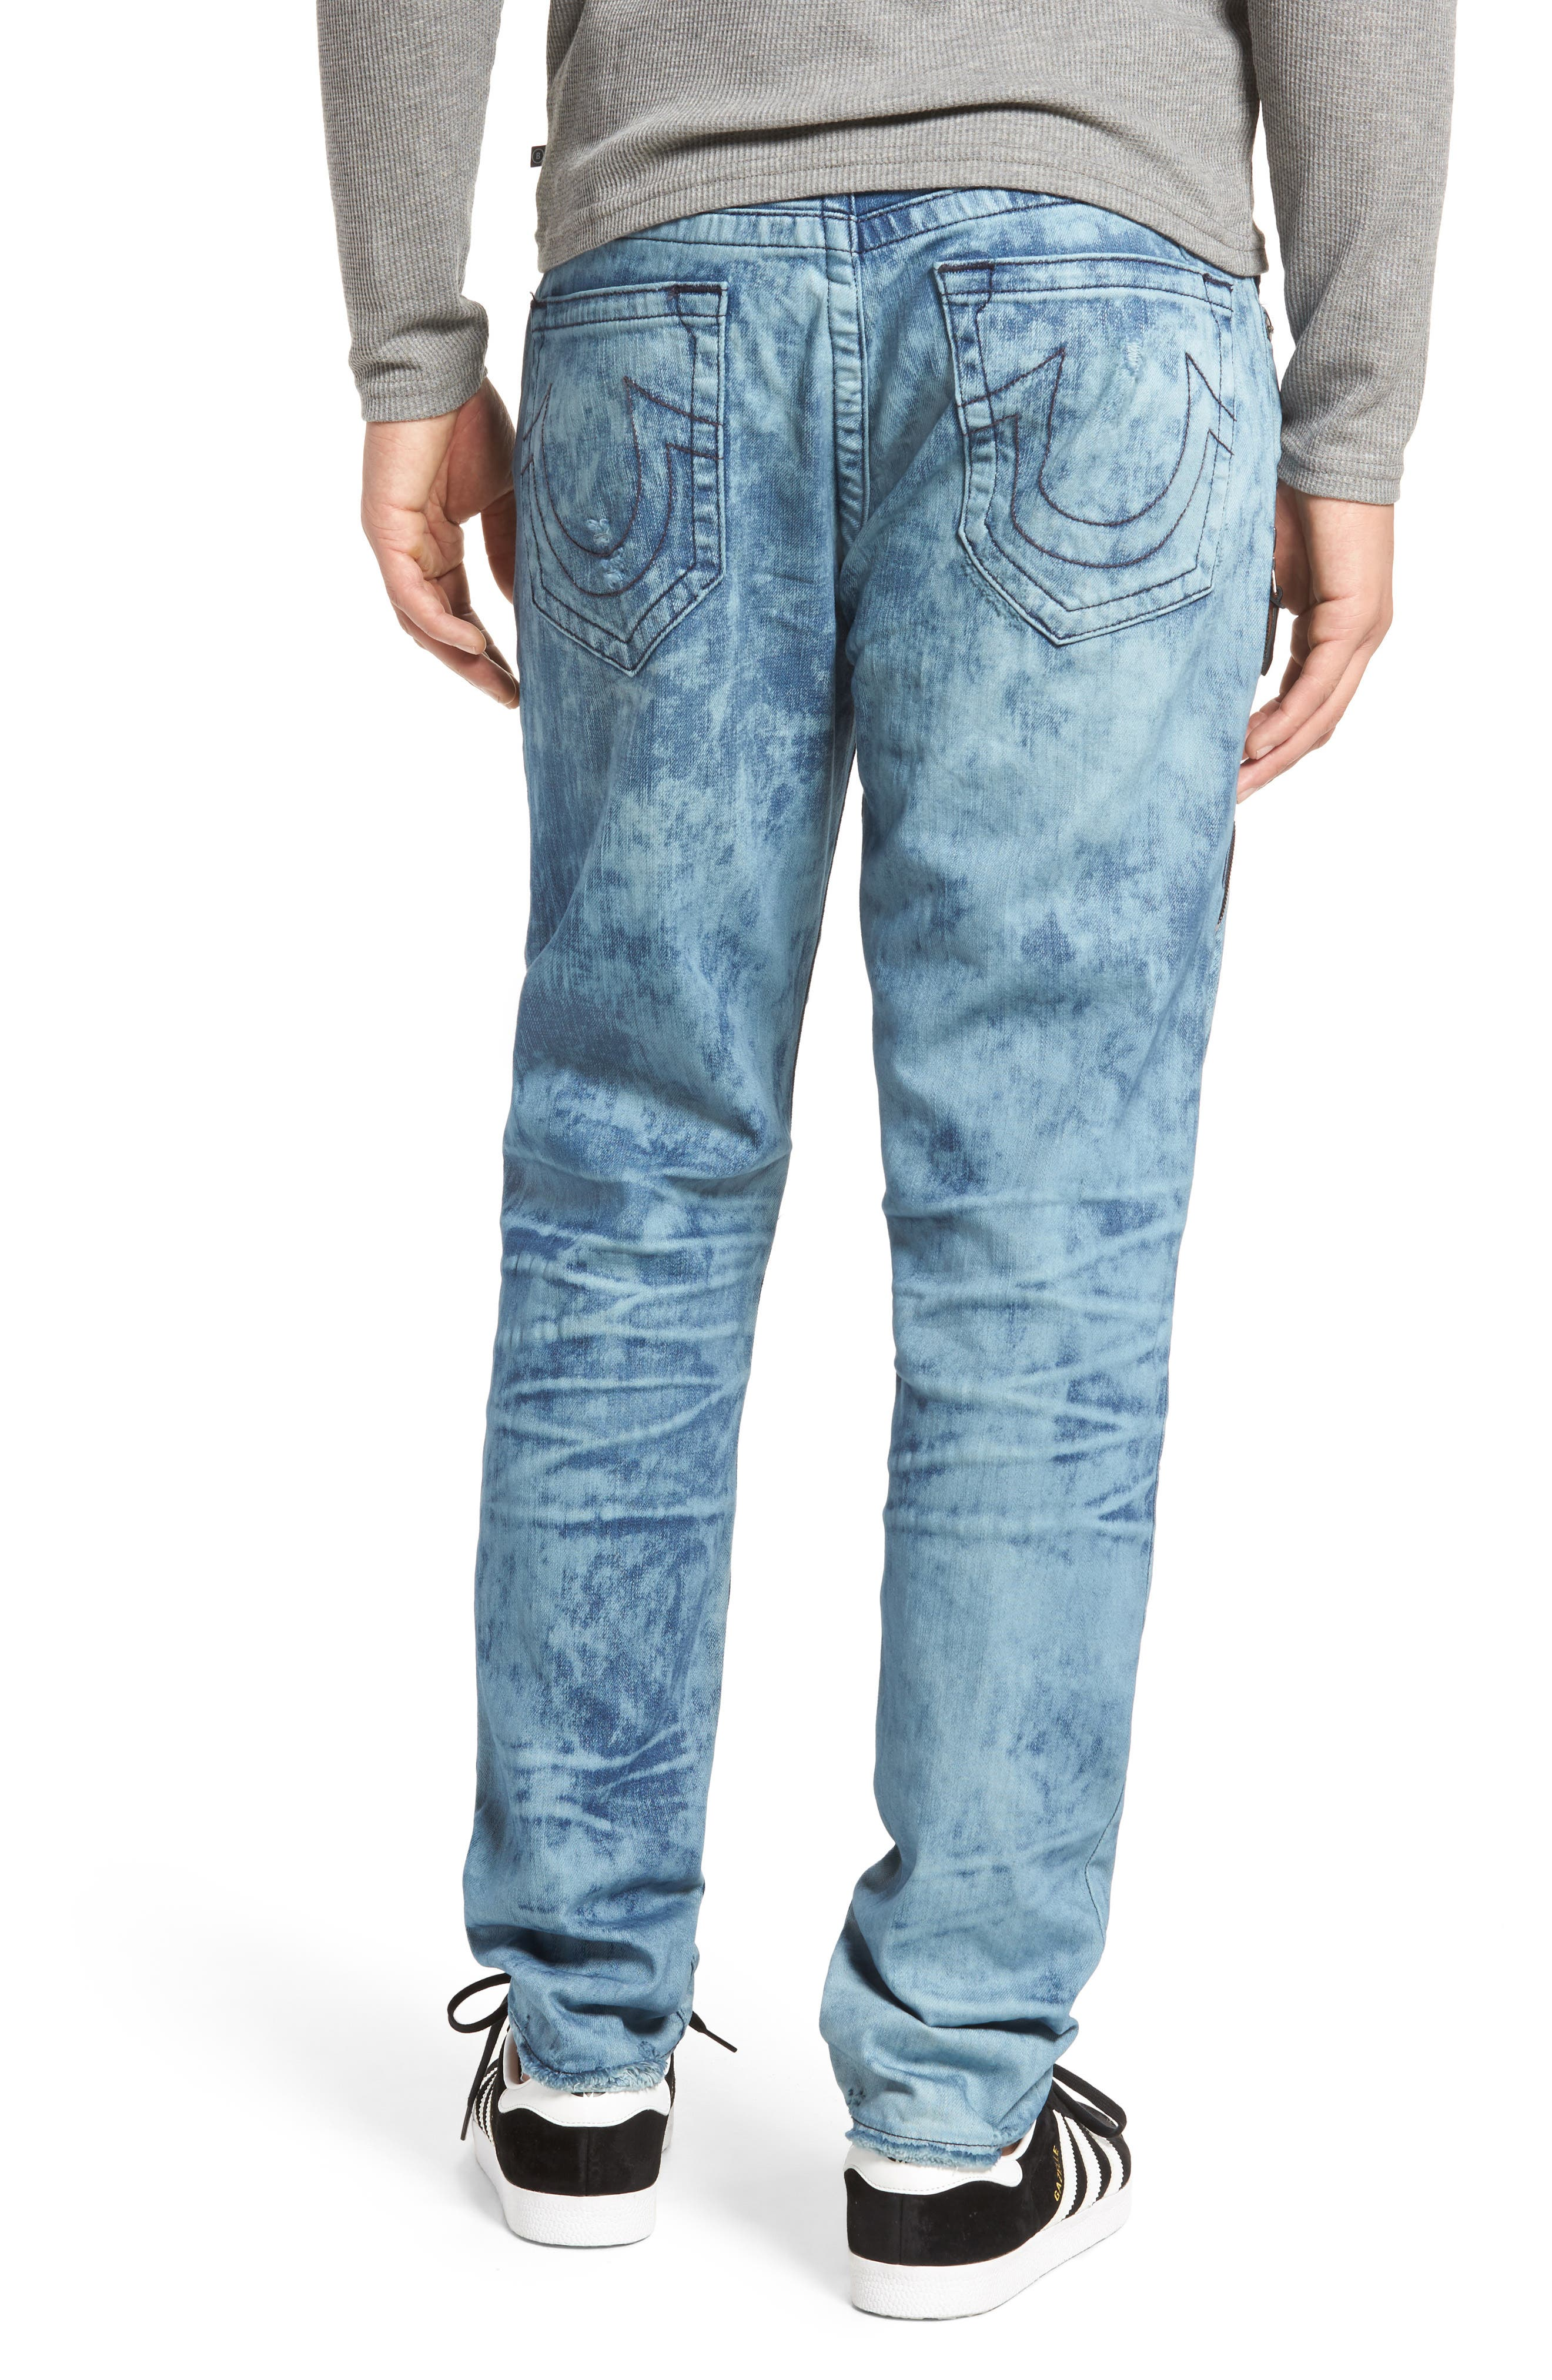 Mick Skinny Fit Jeans,                             Alternate thumbnail 2, color,                             401